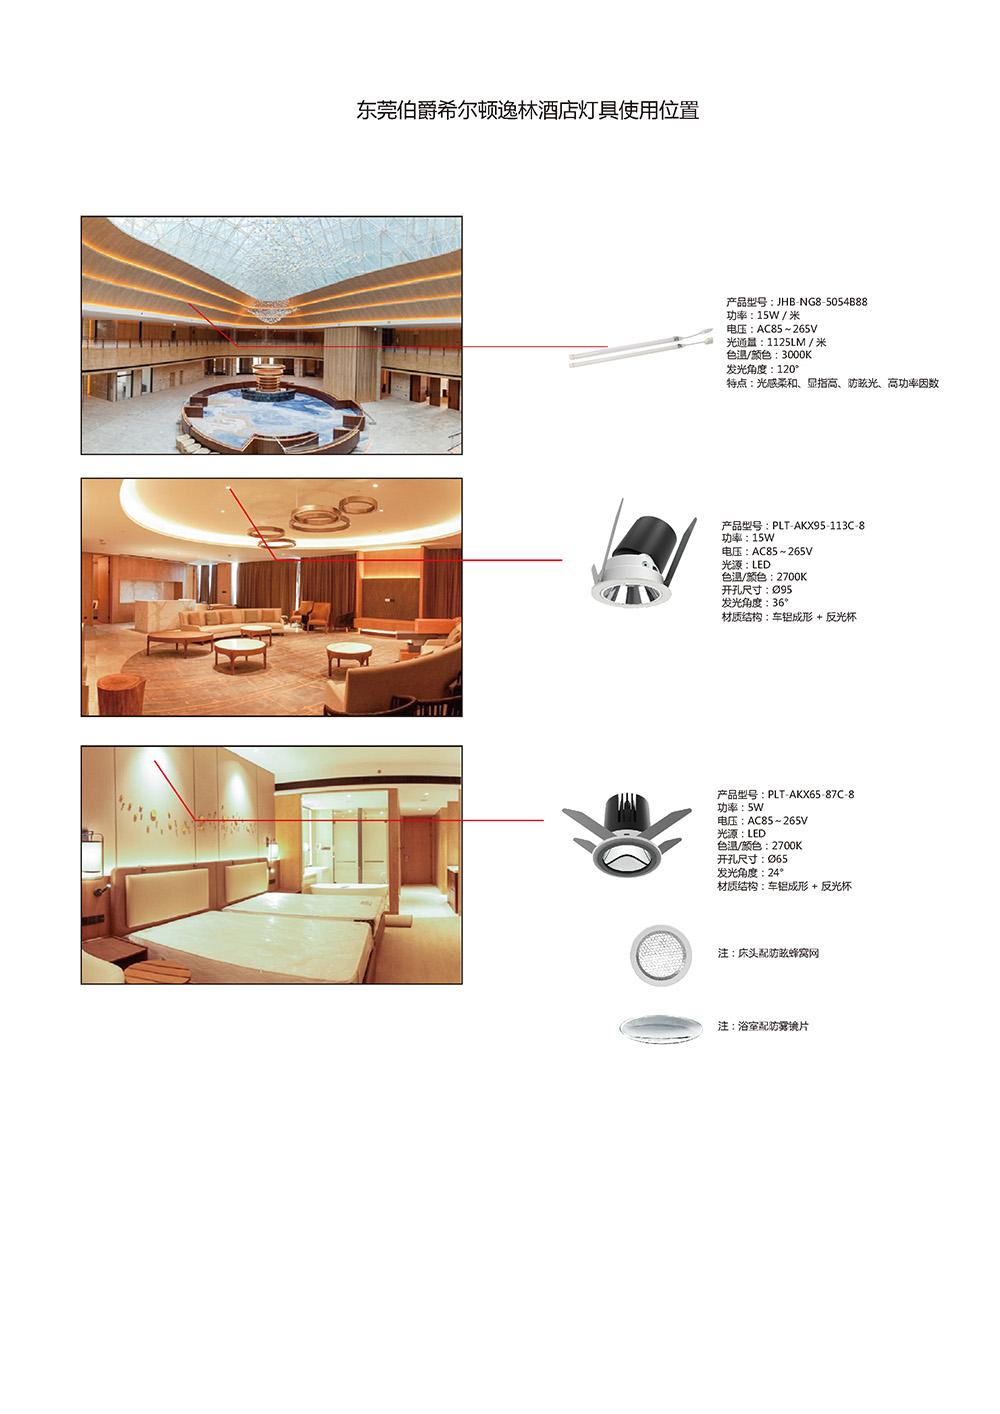 JPEG-4东莞伯爵希尔顿逸林酒店